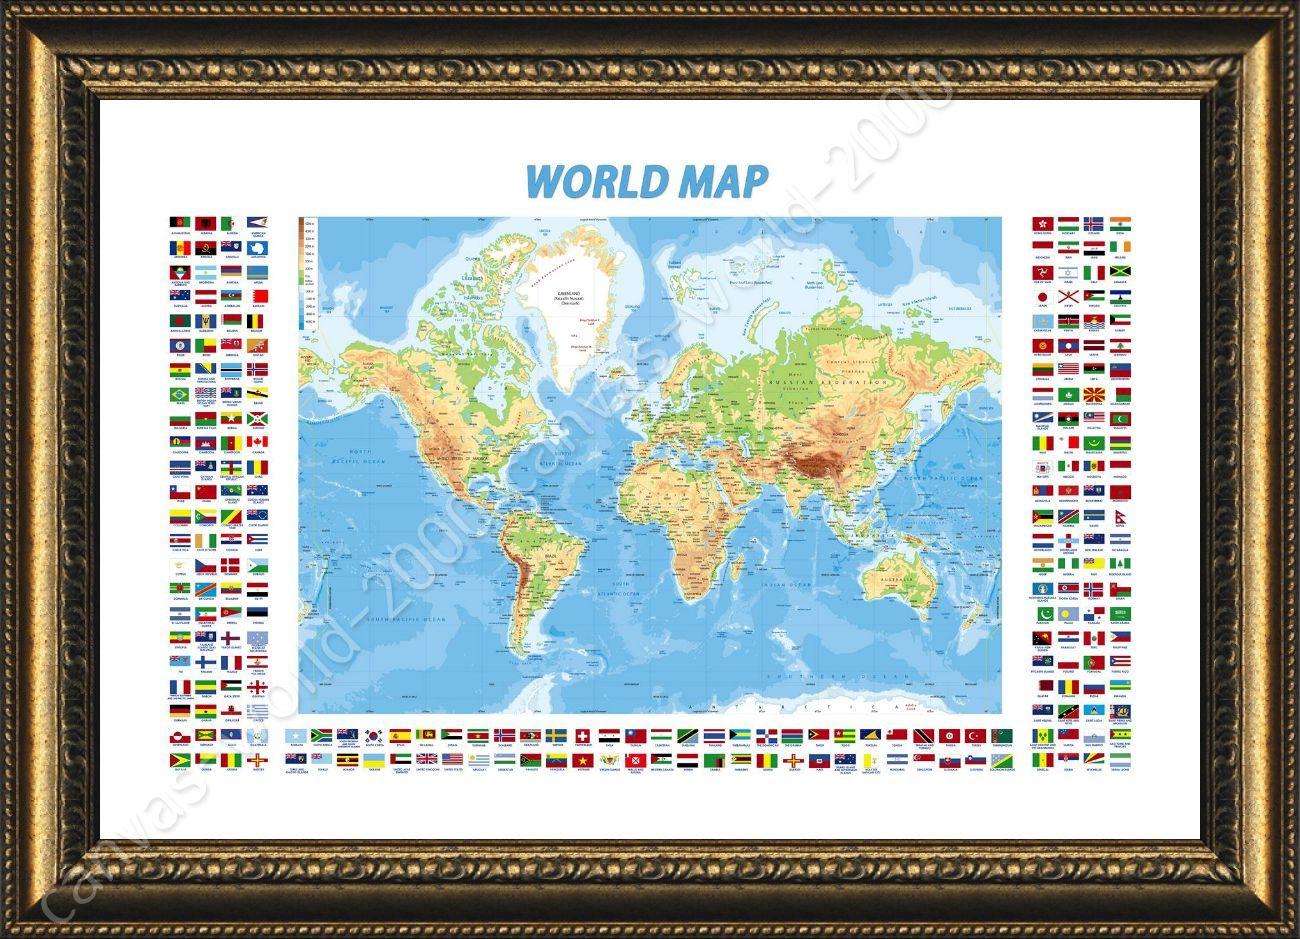 Pster enmarcado fsica moderna banderas mapa del mundo enmarcado framed poster physical modern flags world map framed paintings framed print gumiabroncs Gallery